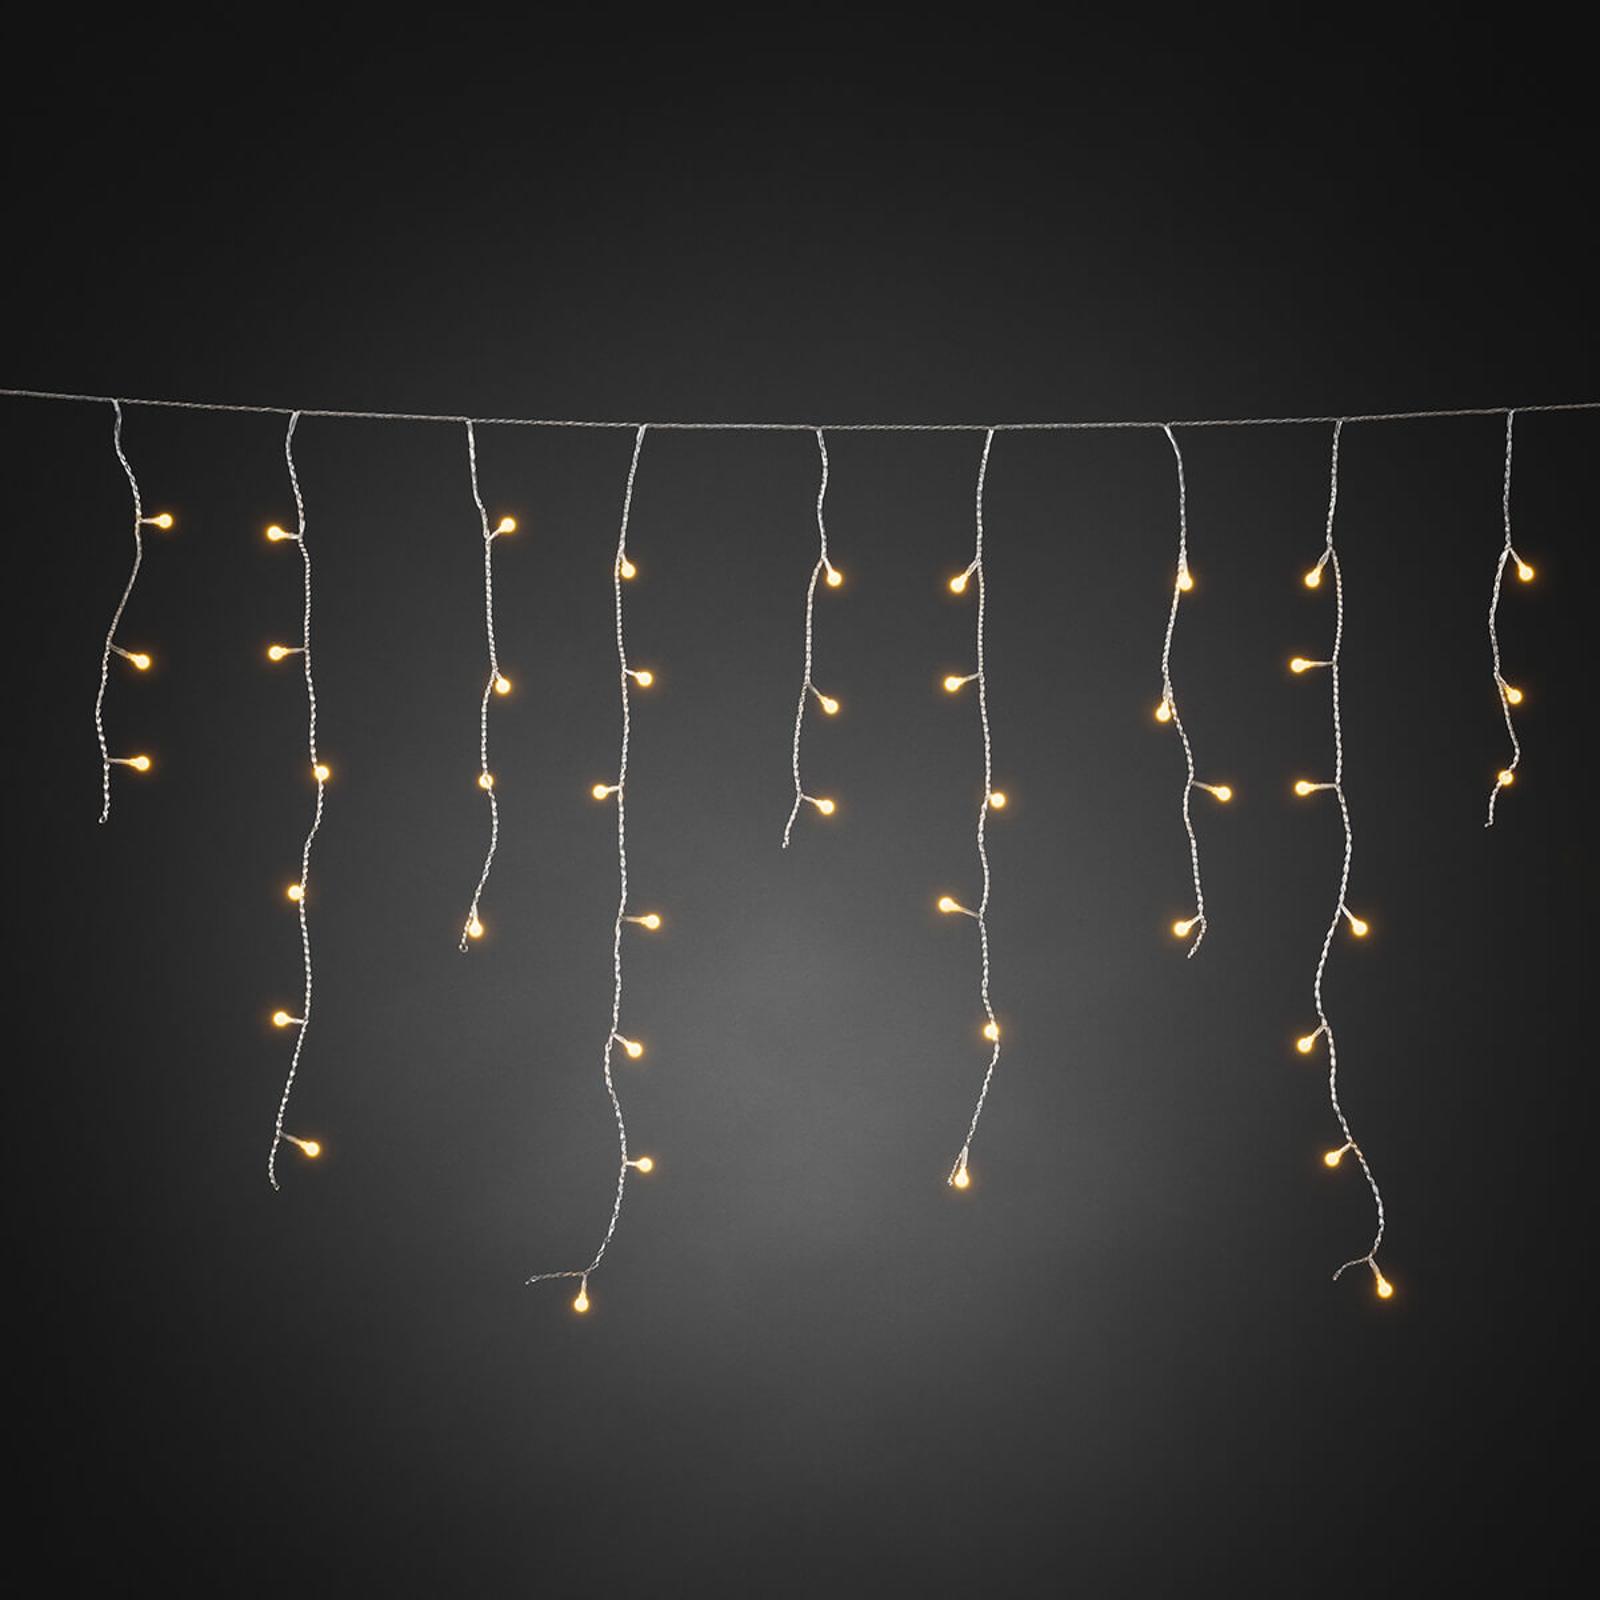 LED lichtgordijn Eisregen amber transp. 5m